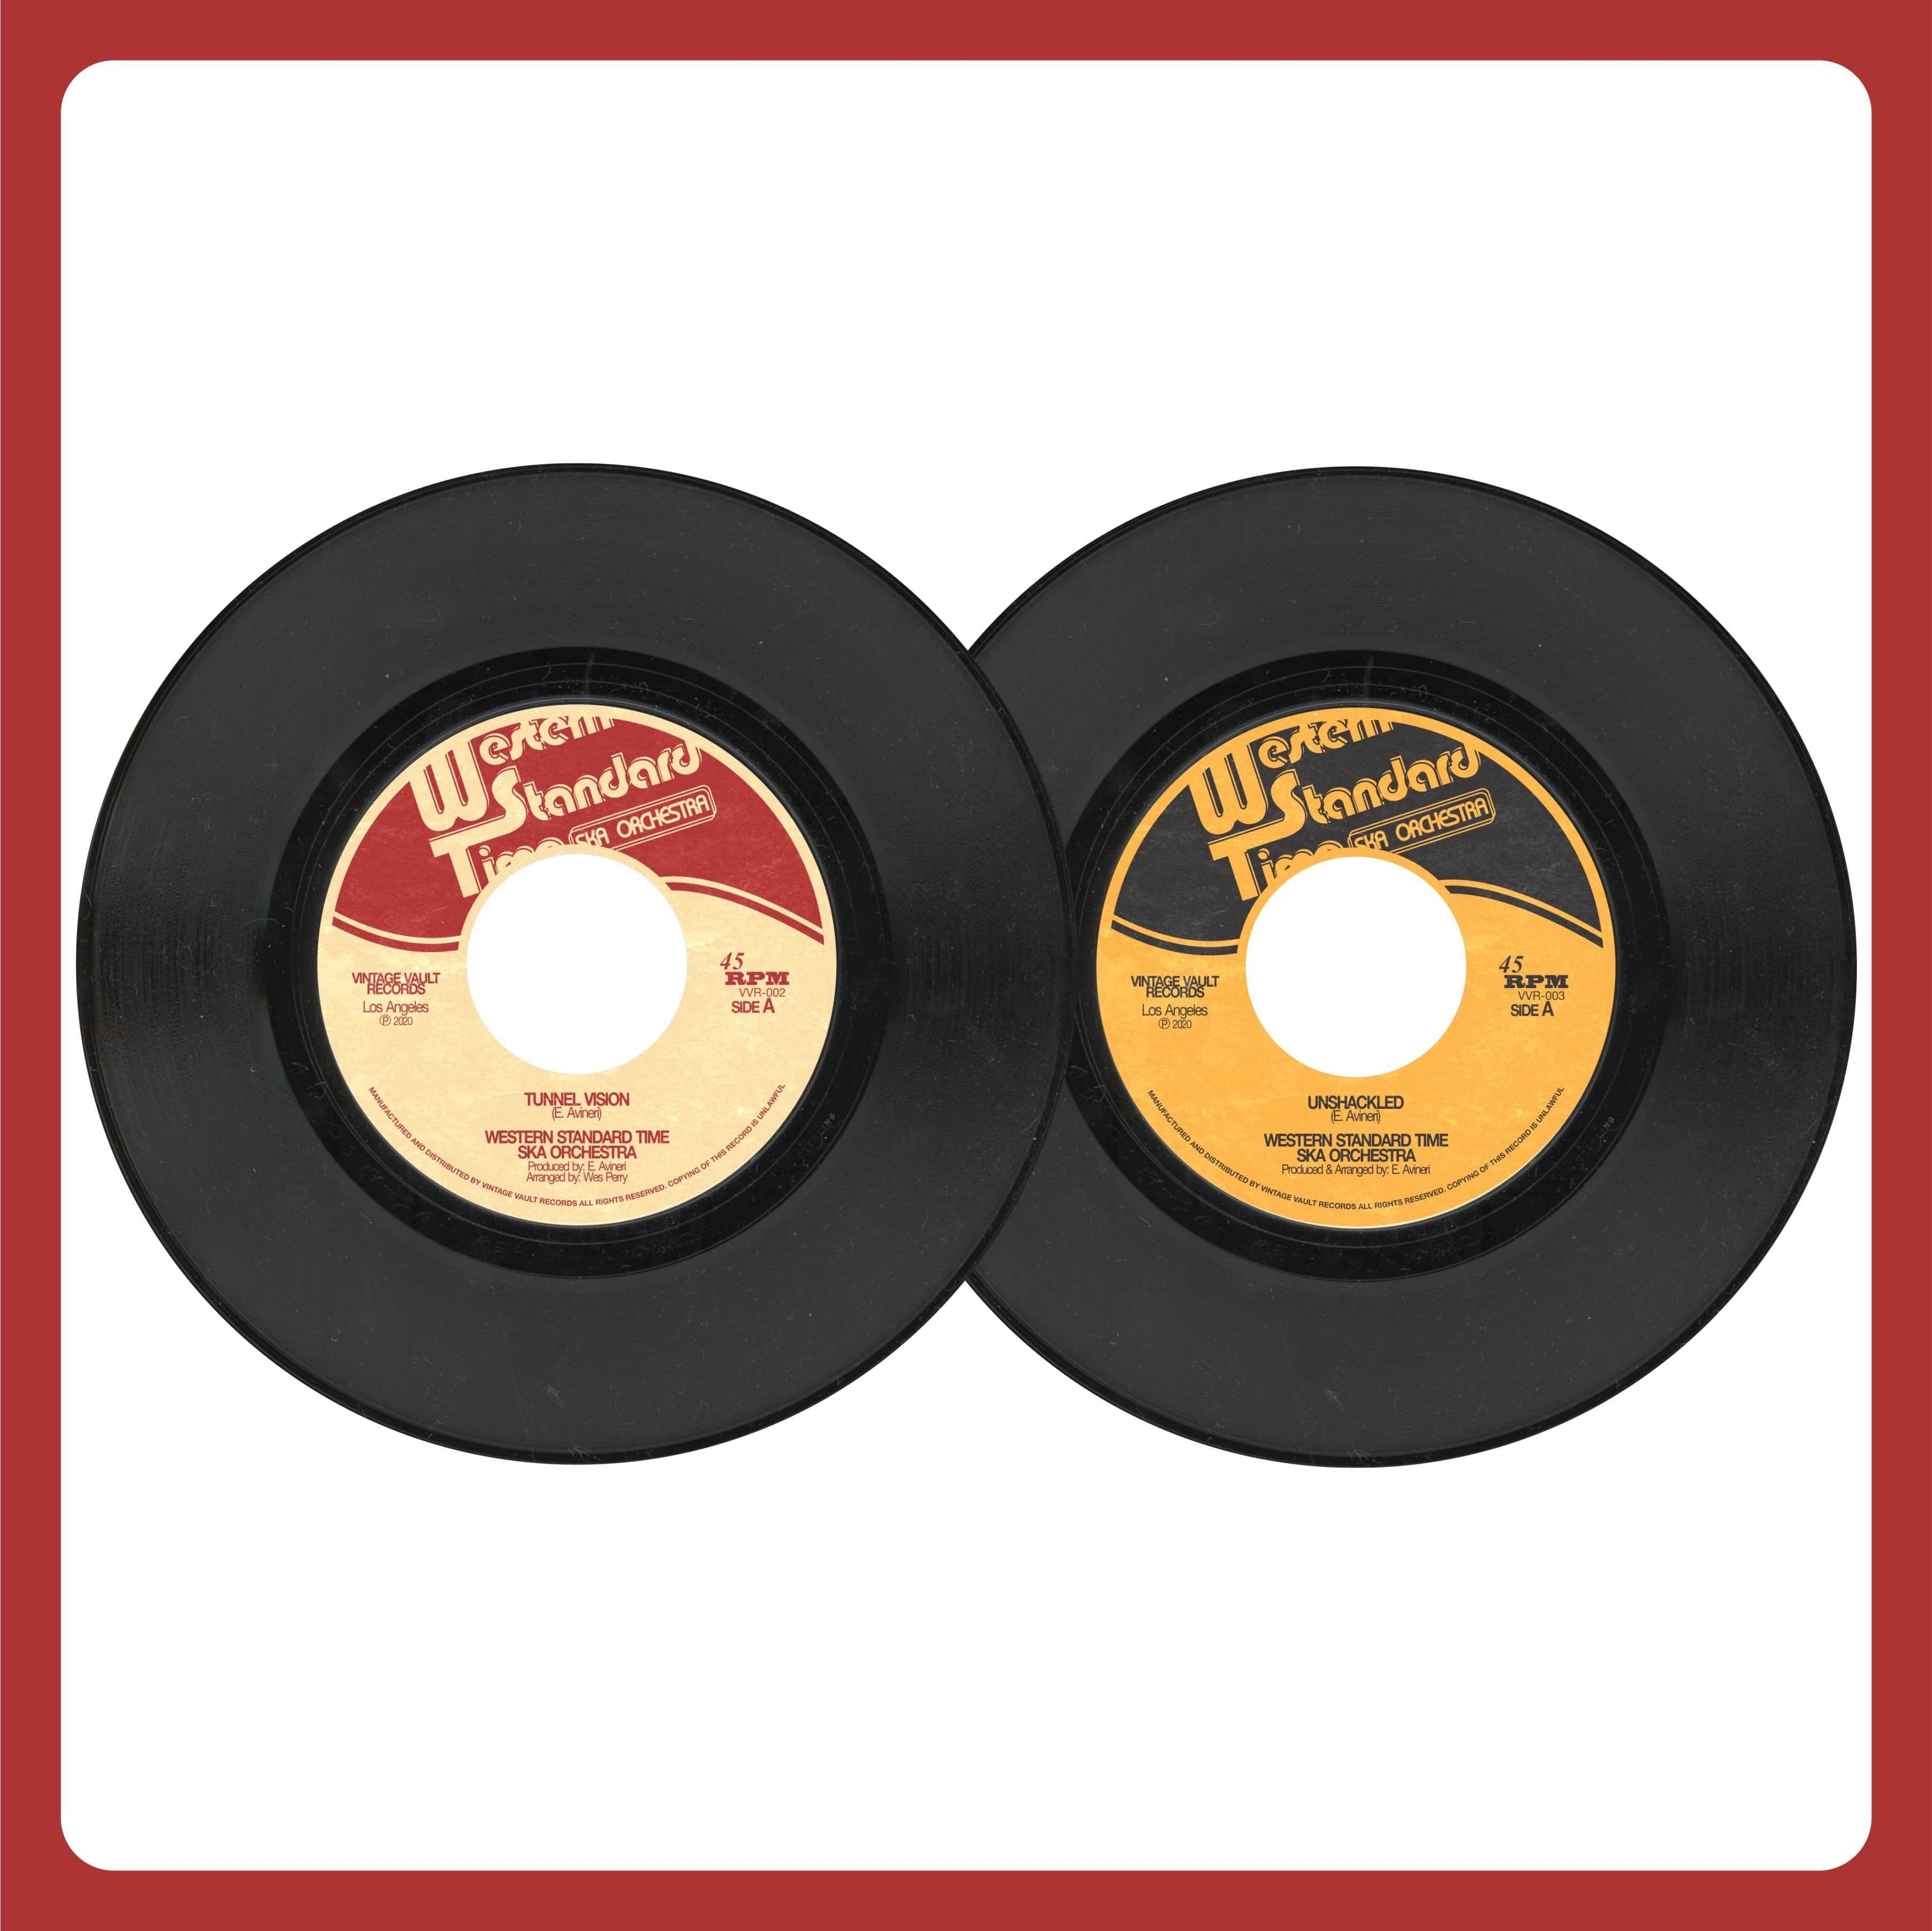 WST SKA - Vinyl 45 Bundle